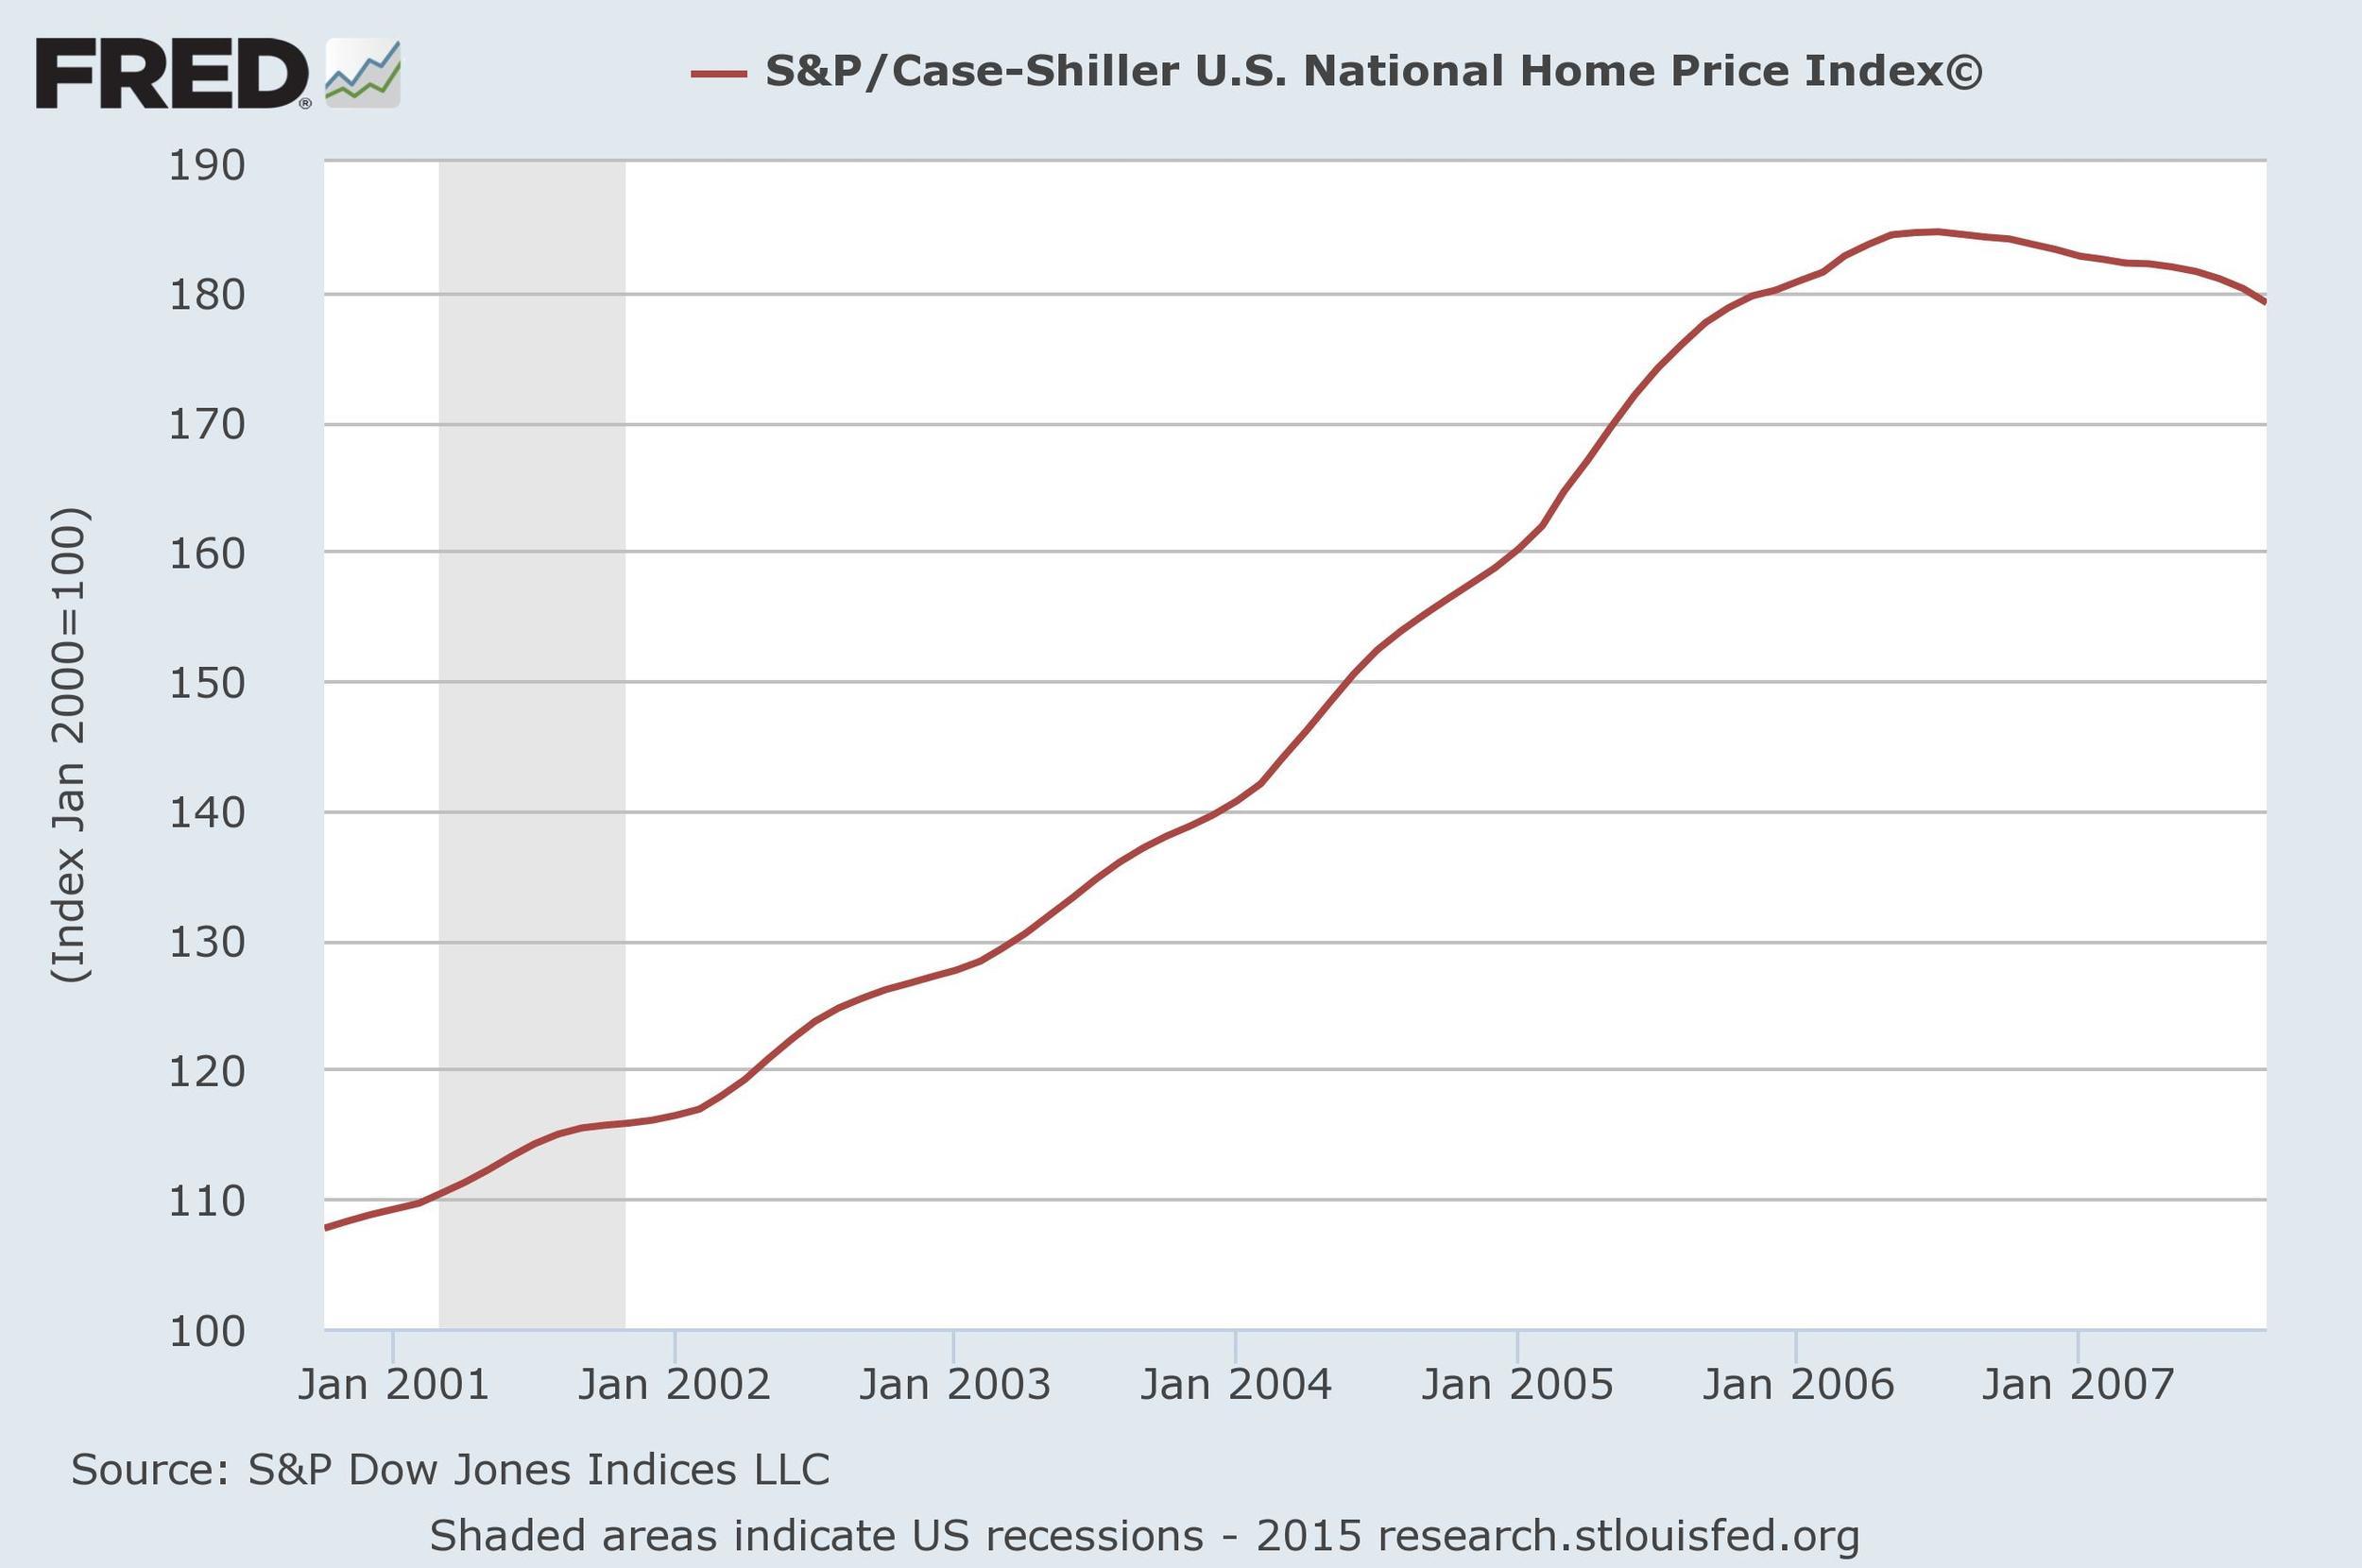 source: S&P Dow Jones Indices LLC, St. Louis Fed